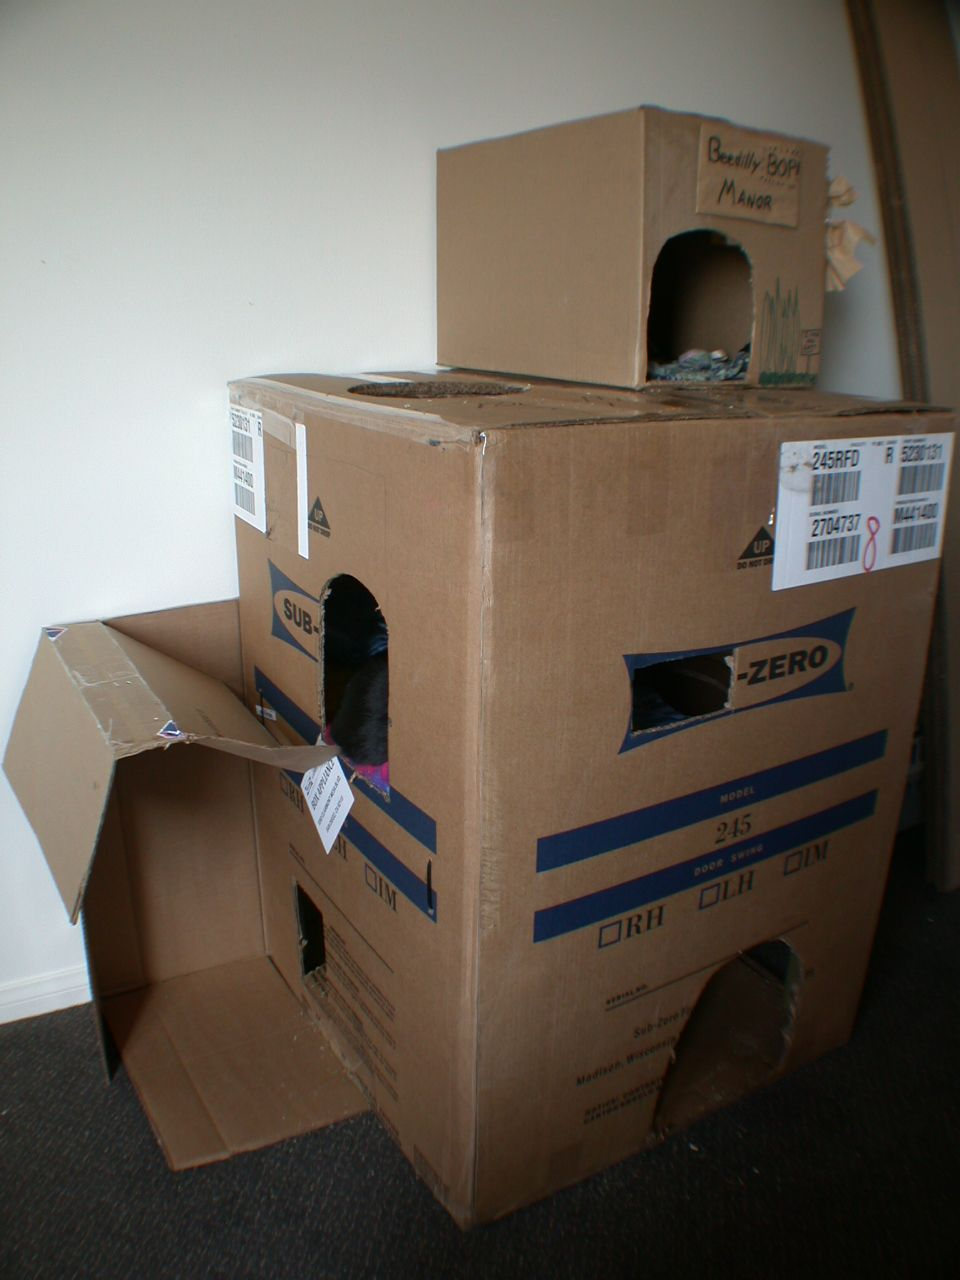 Diy Cardboard Cat Houses | Tutorial: DIY Cat Tree / Condo / Resort From Cardboard  Cardboard Cat ... Iu0027ve Got Boxes Everywhere So Why Not?!?